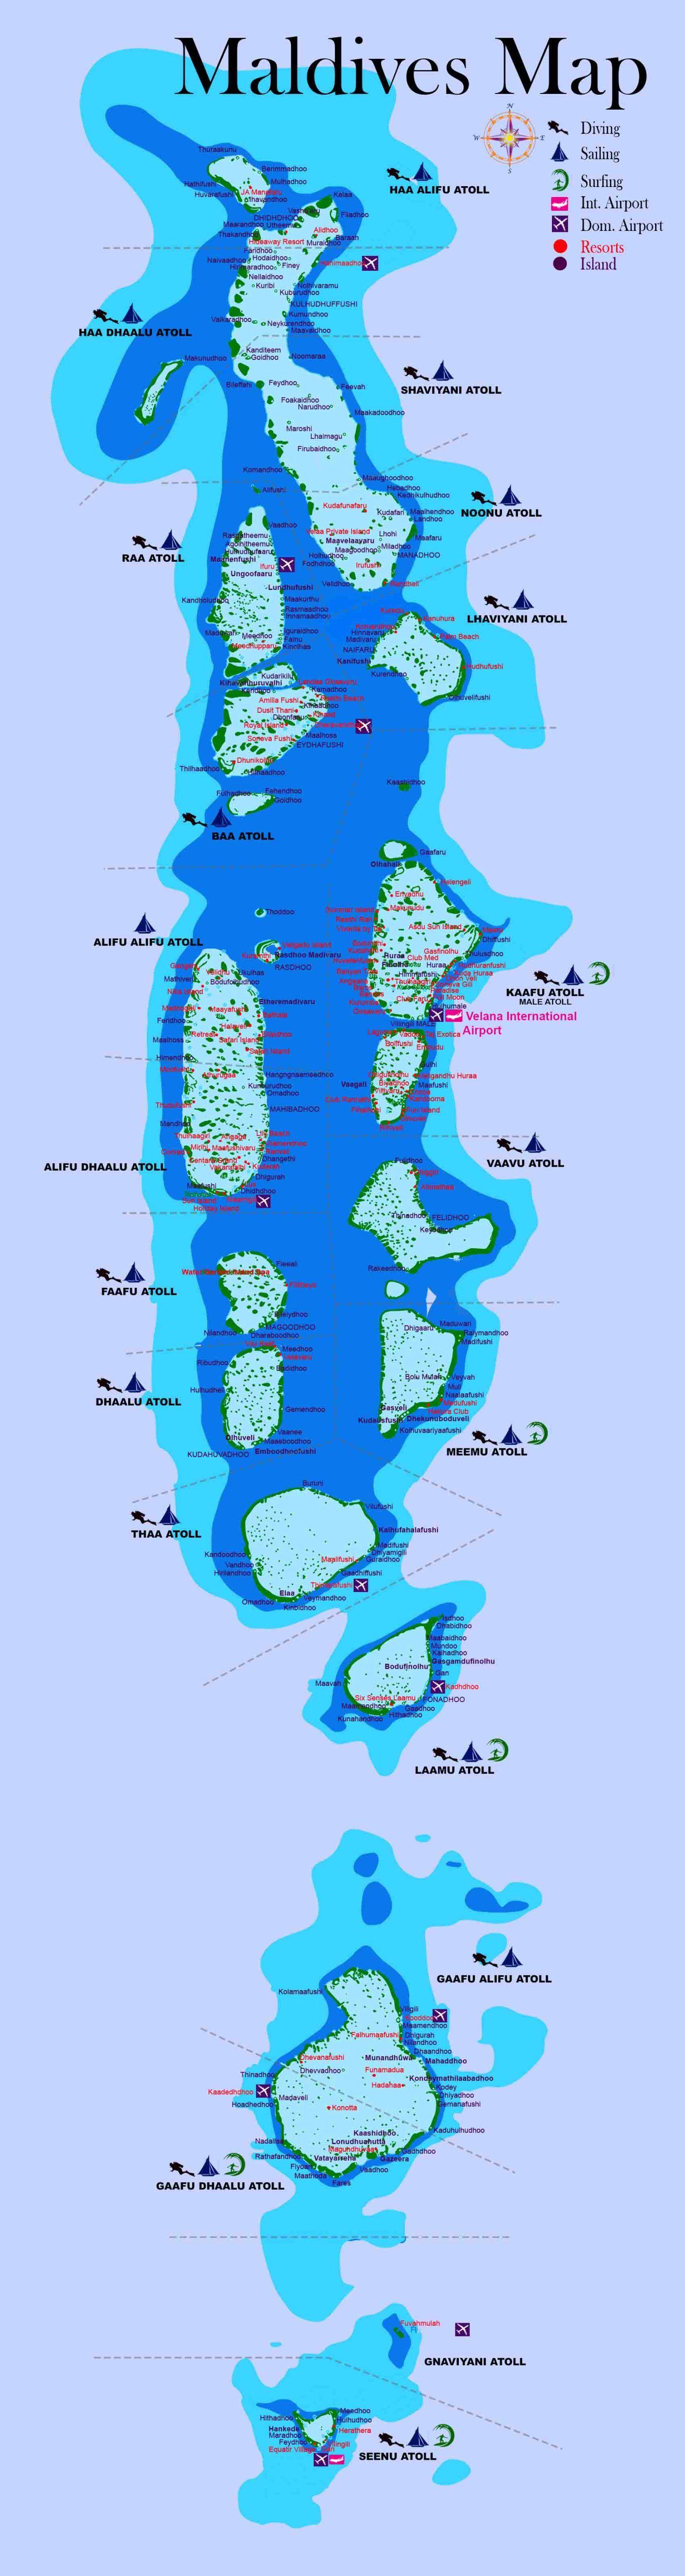 Where is Maldives Island located | Best in Maldives ...